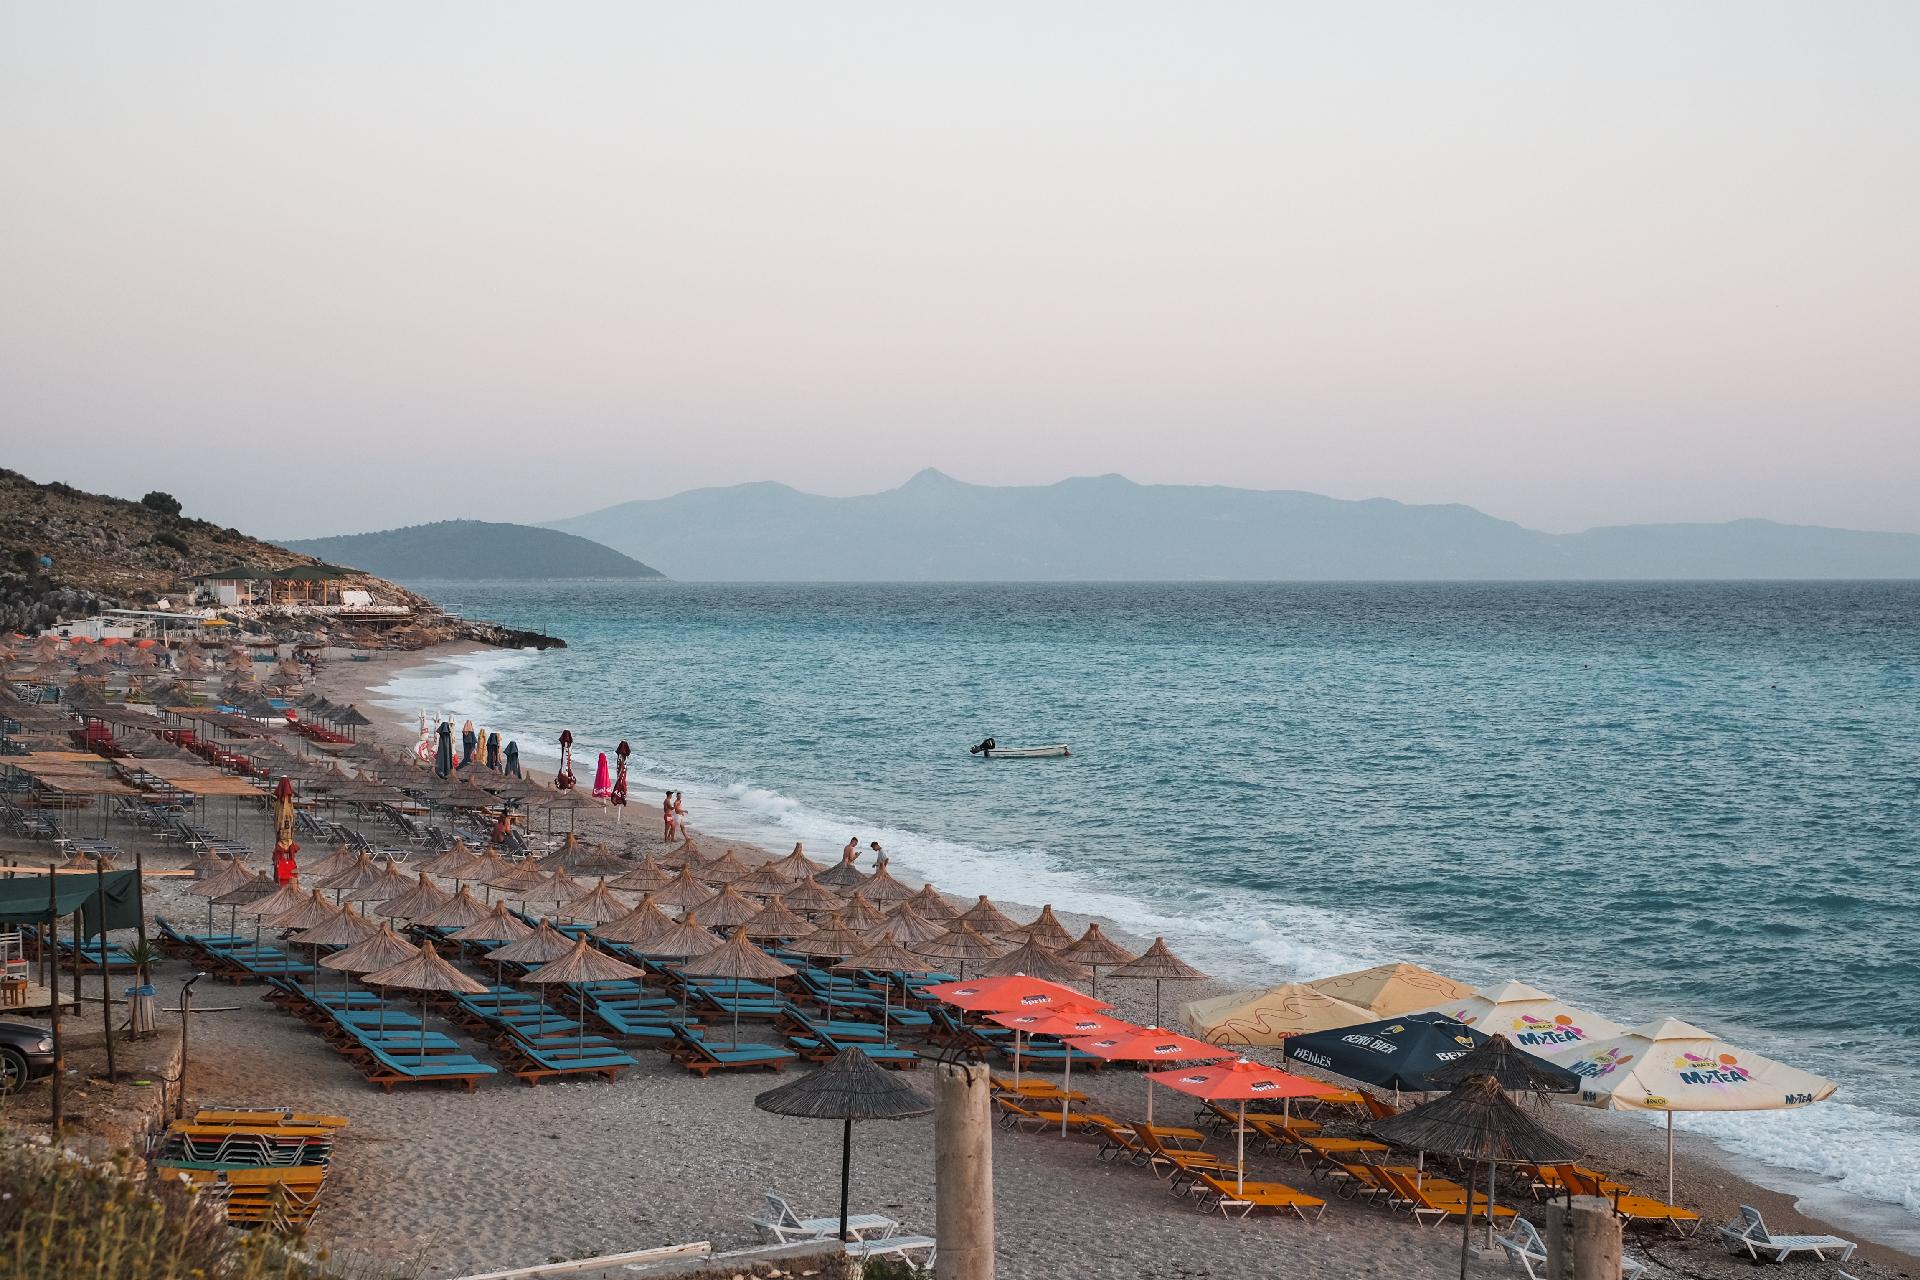 Lukovë beach, Albania road trip